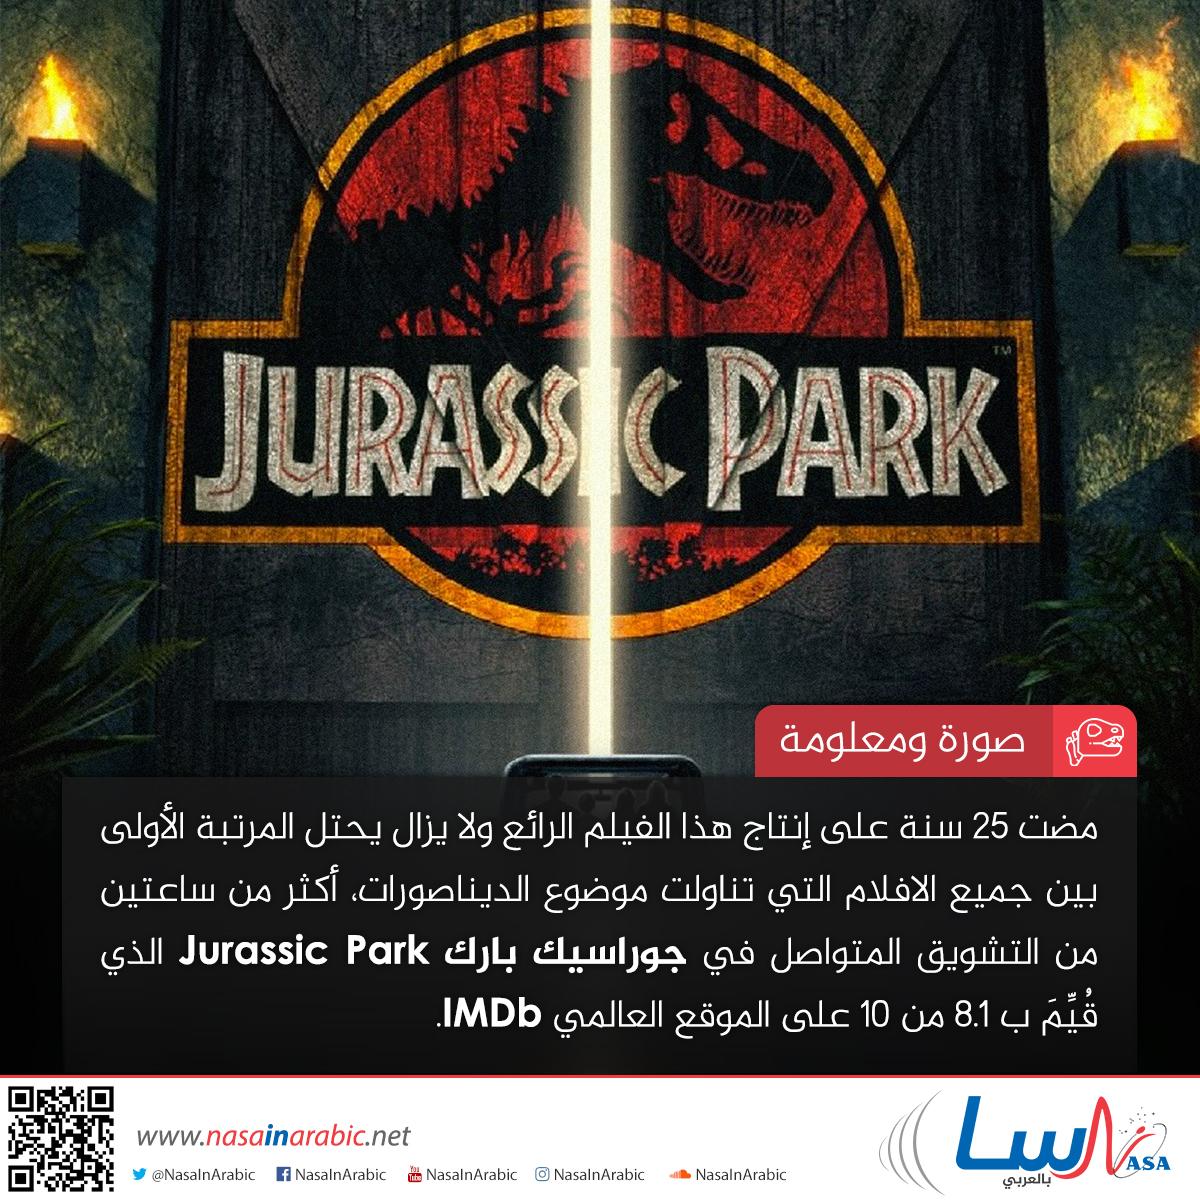 جوراسيك بارك Jurassic Park